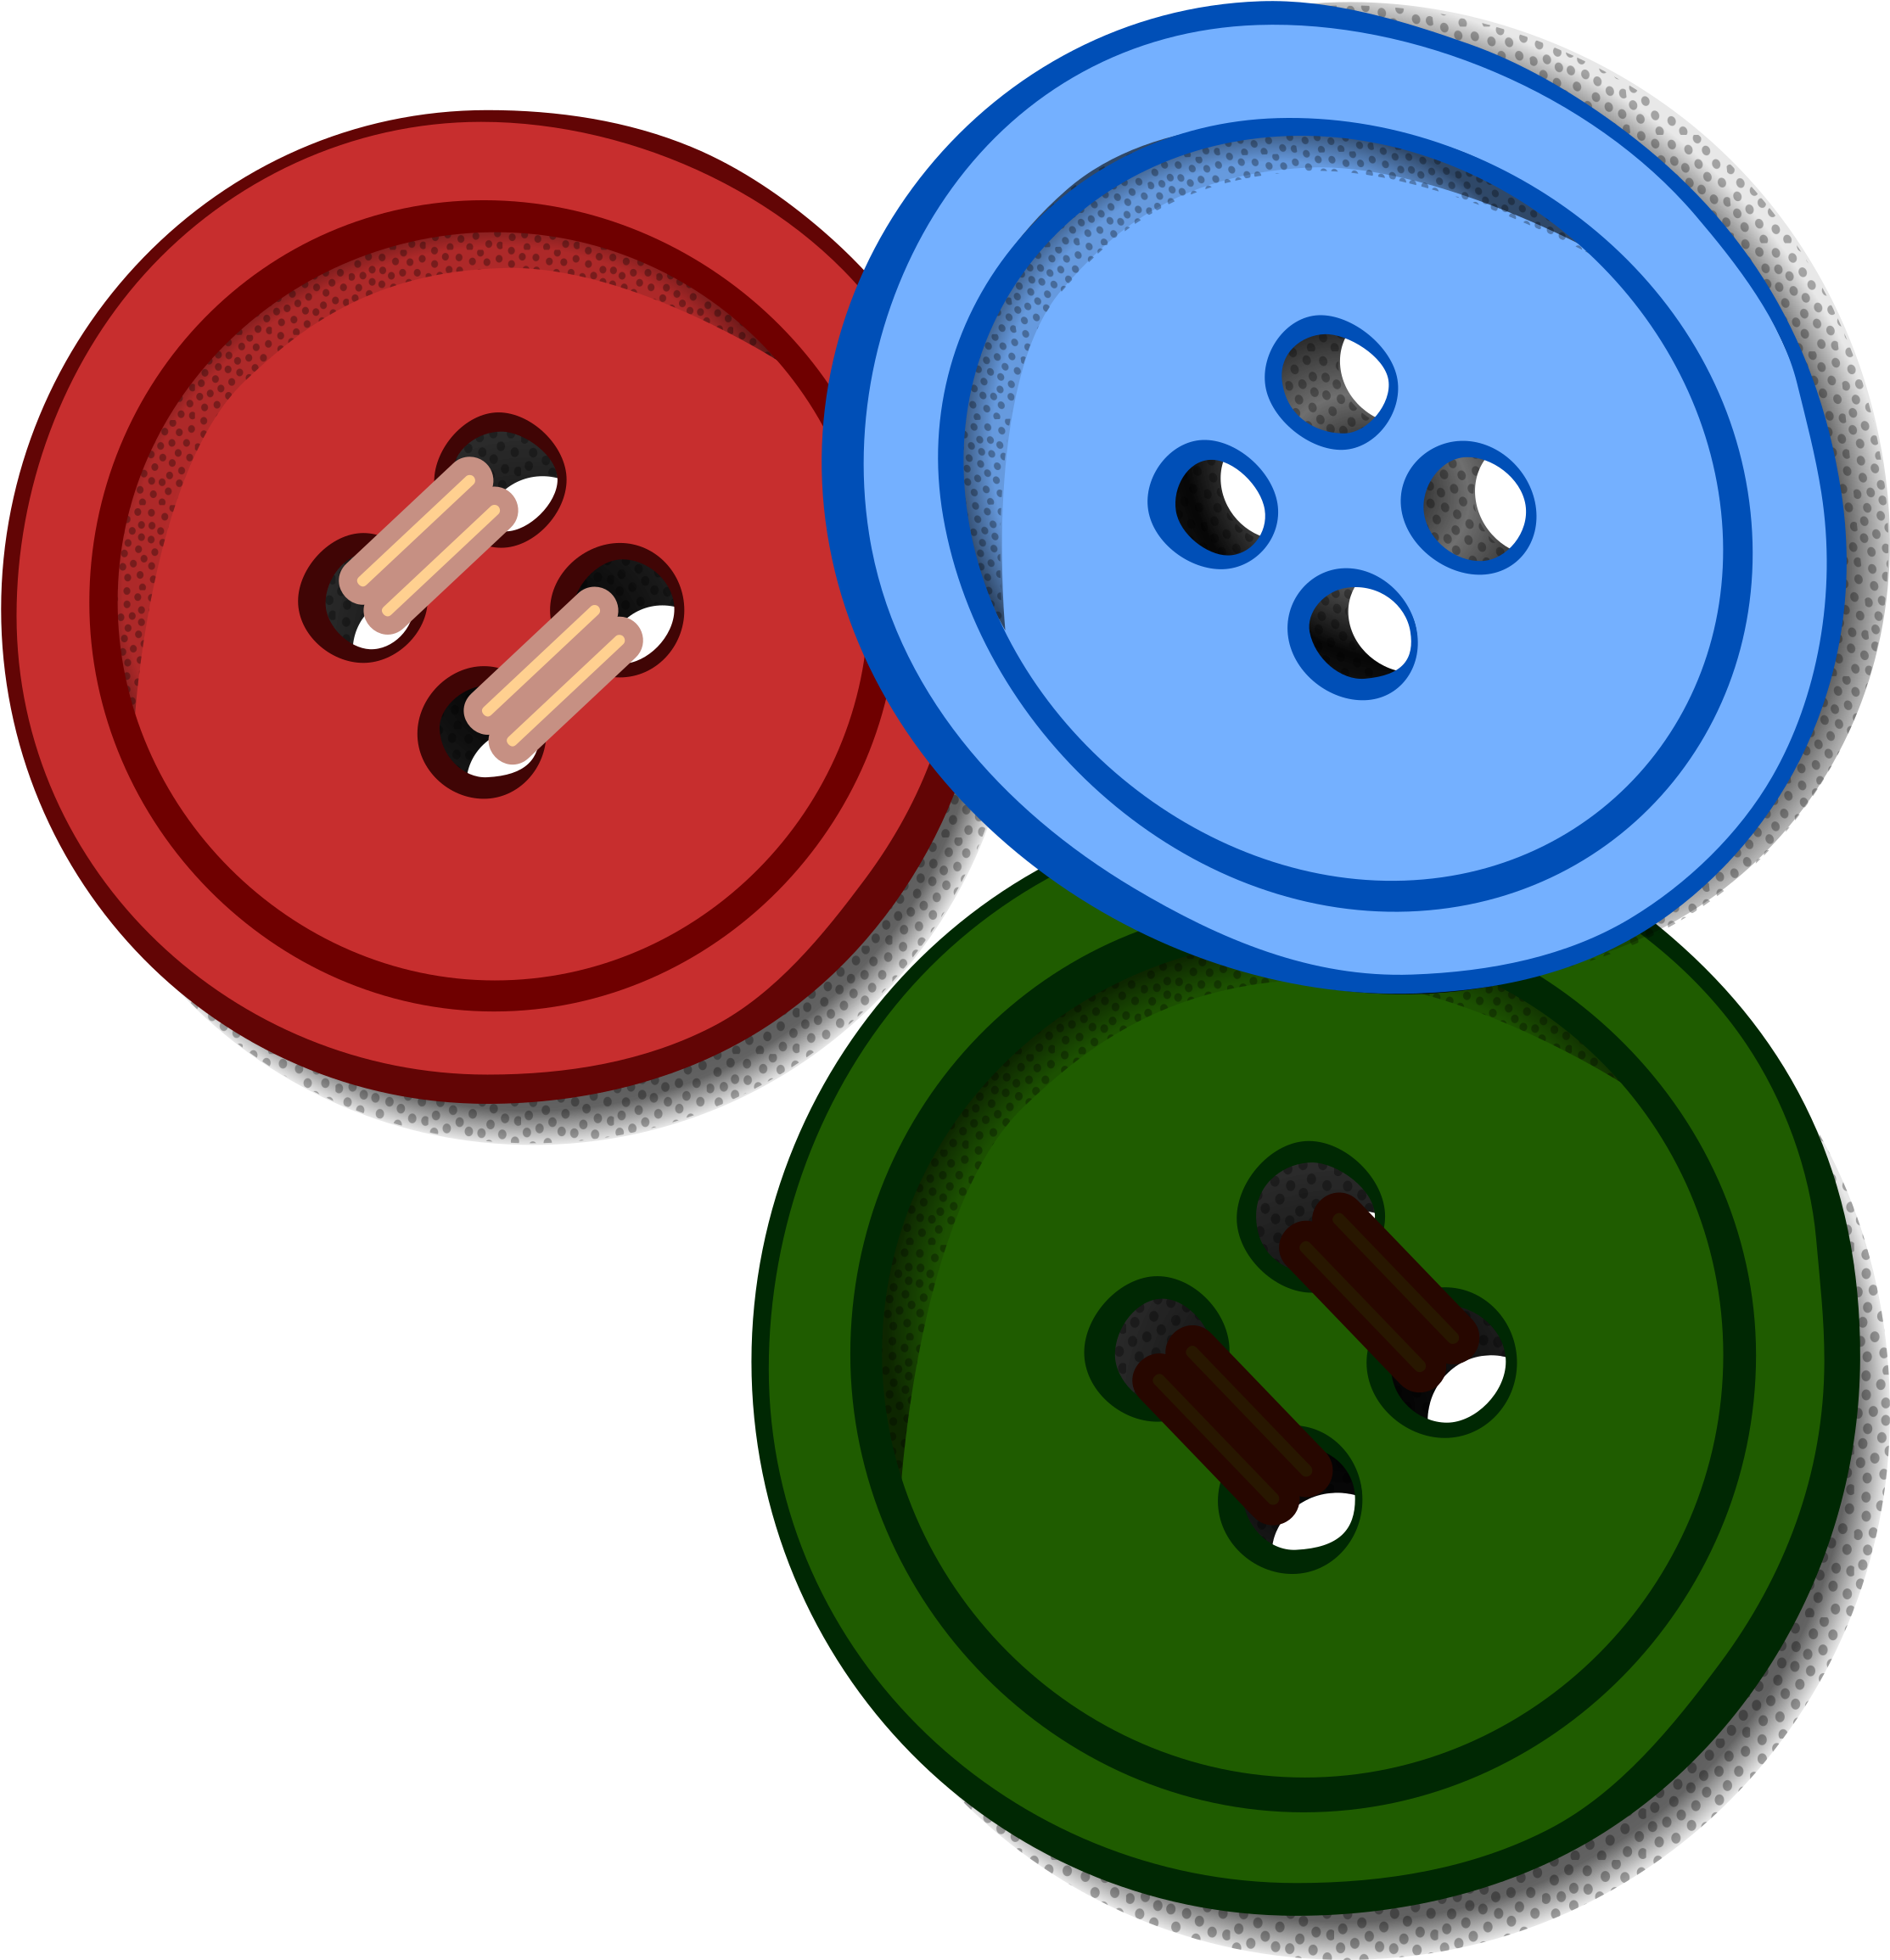 Clipart - Buttons Clipart (2400x2400)